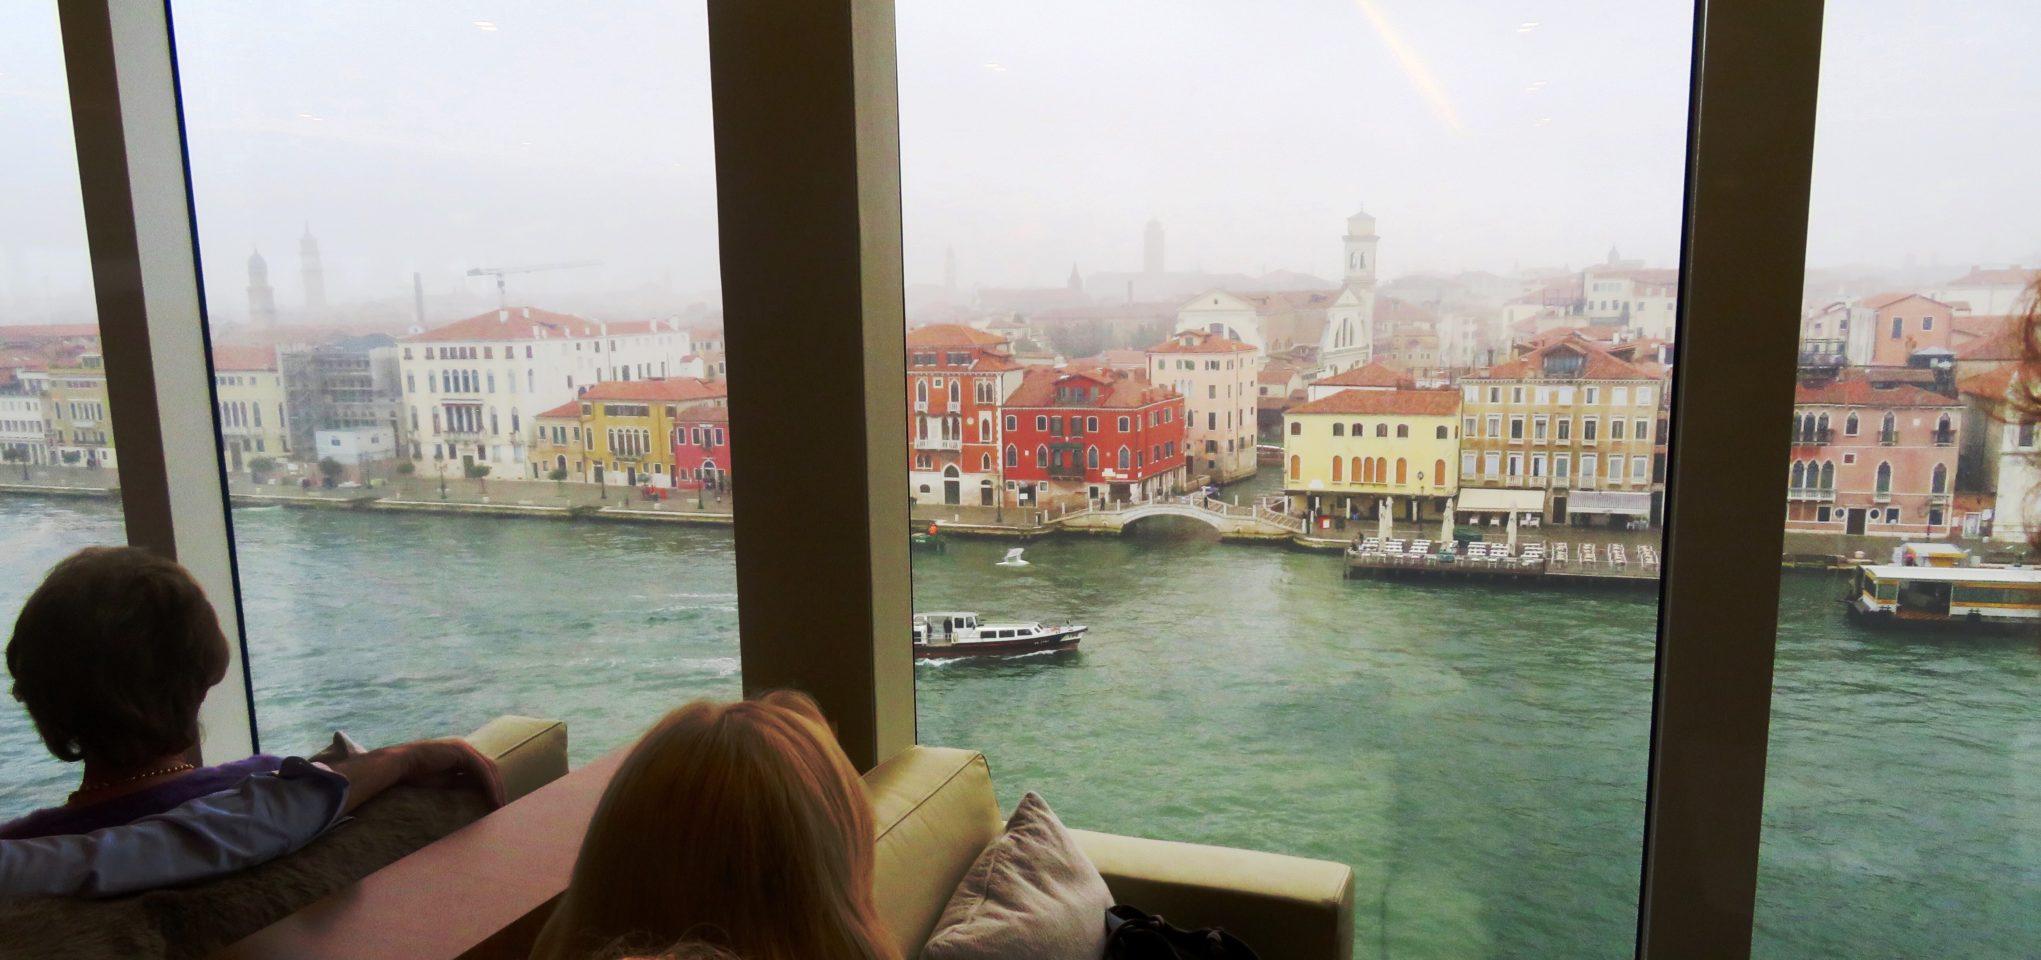 <em><strong>Viking Ocean Cruise Ships ~</strong> </em> Viking Star entering Venice Italy